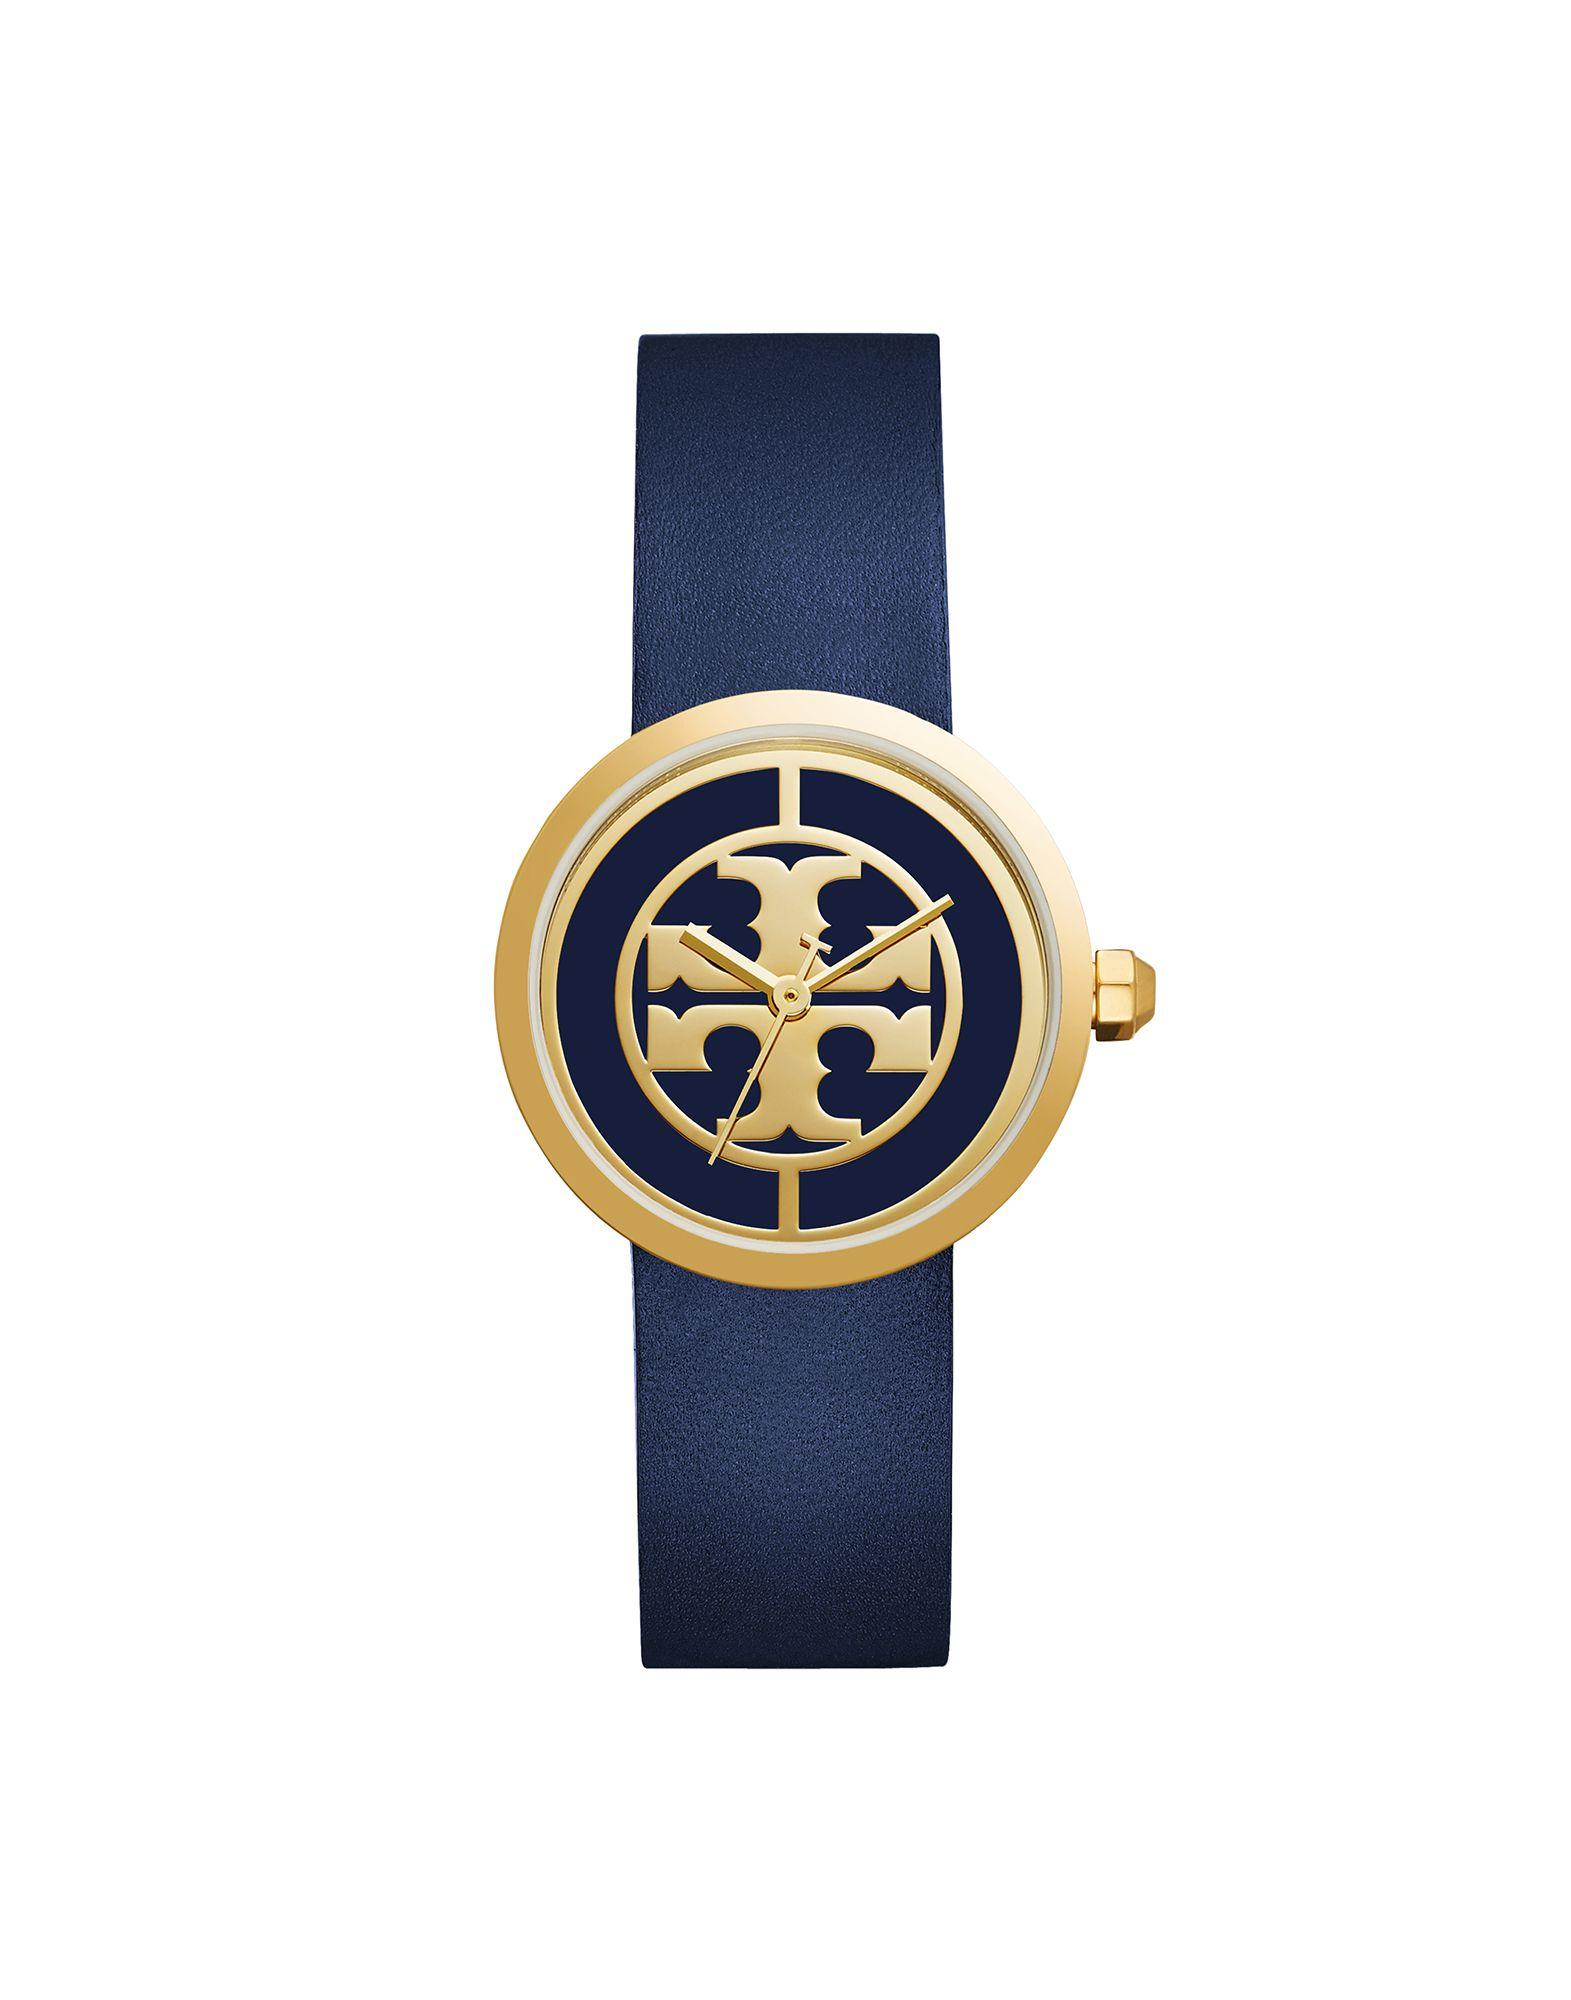 TORY BURCH Damen Armbanduhr Farbe Dunkelblau Größe 1 - broschei